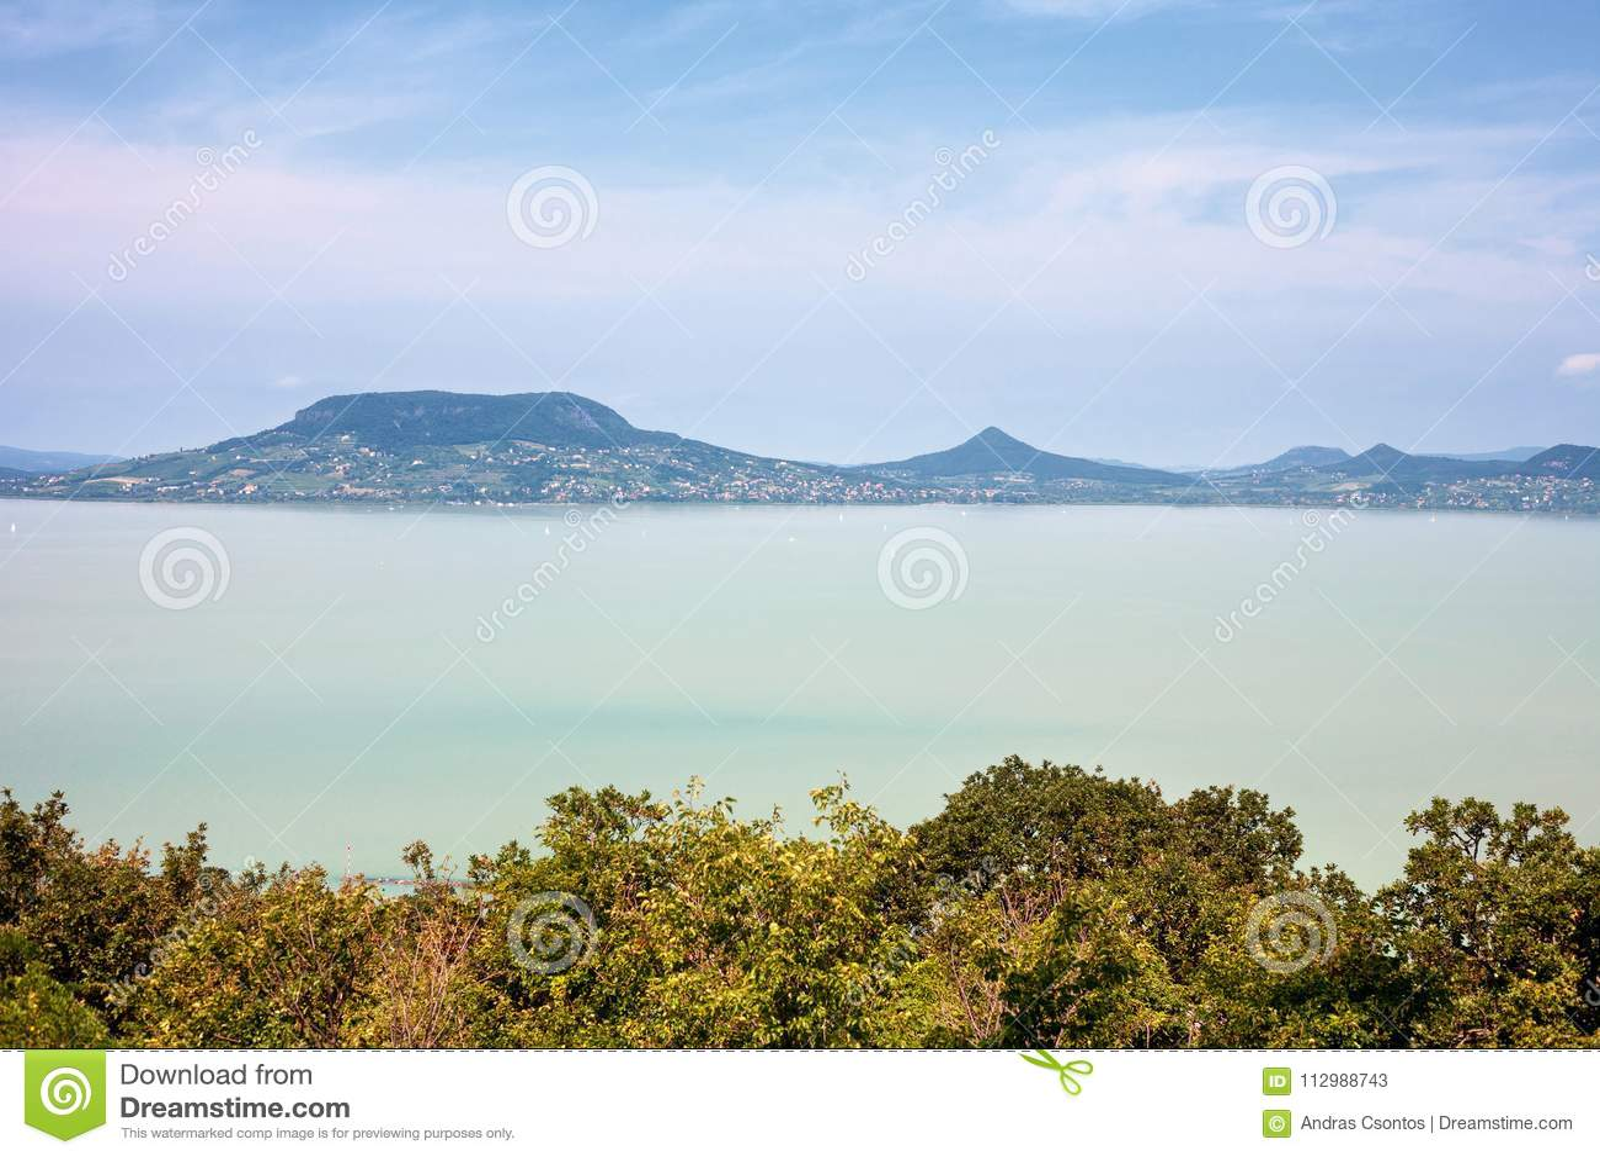 Lake Balaton viewed from the south coast